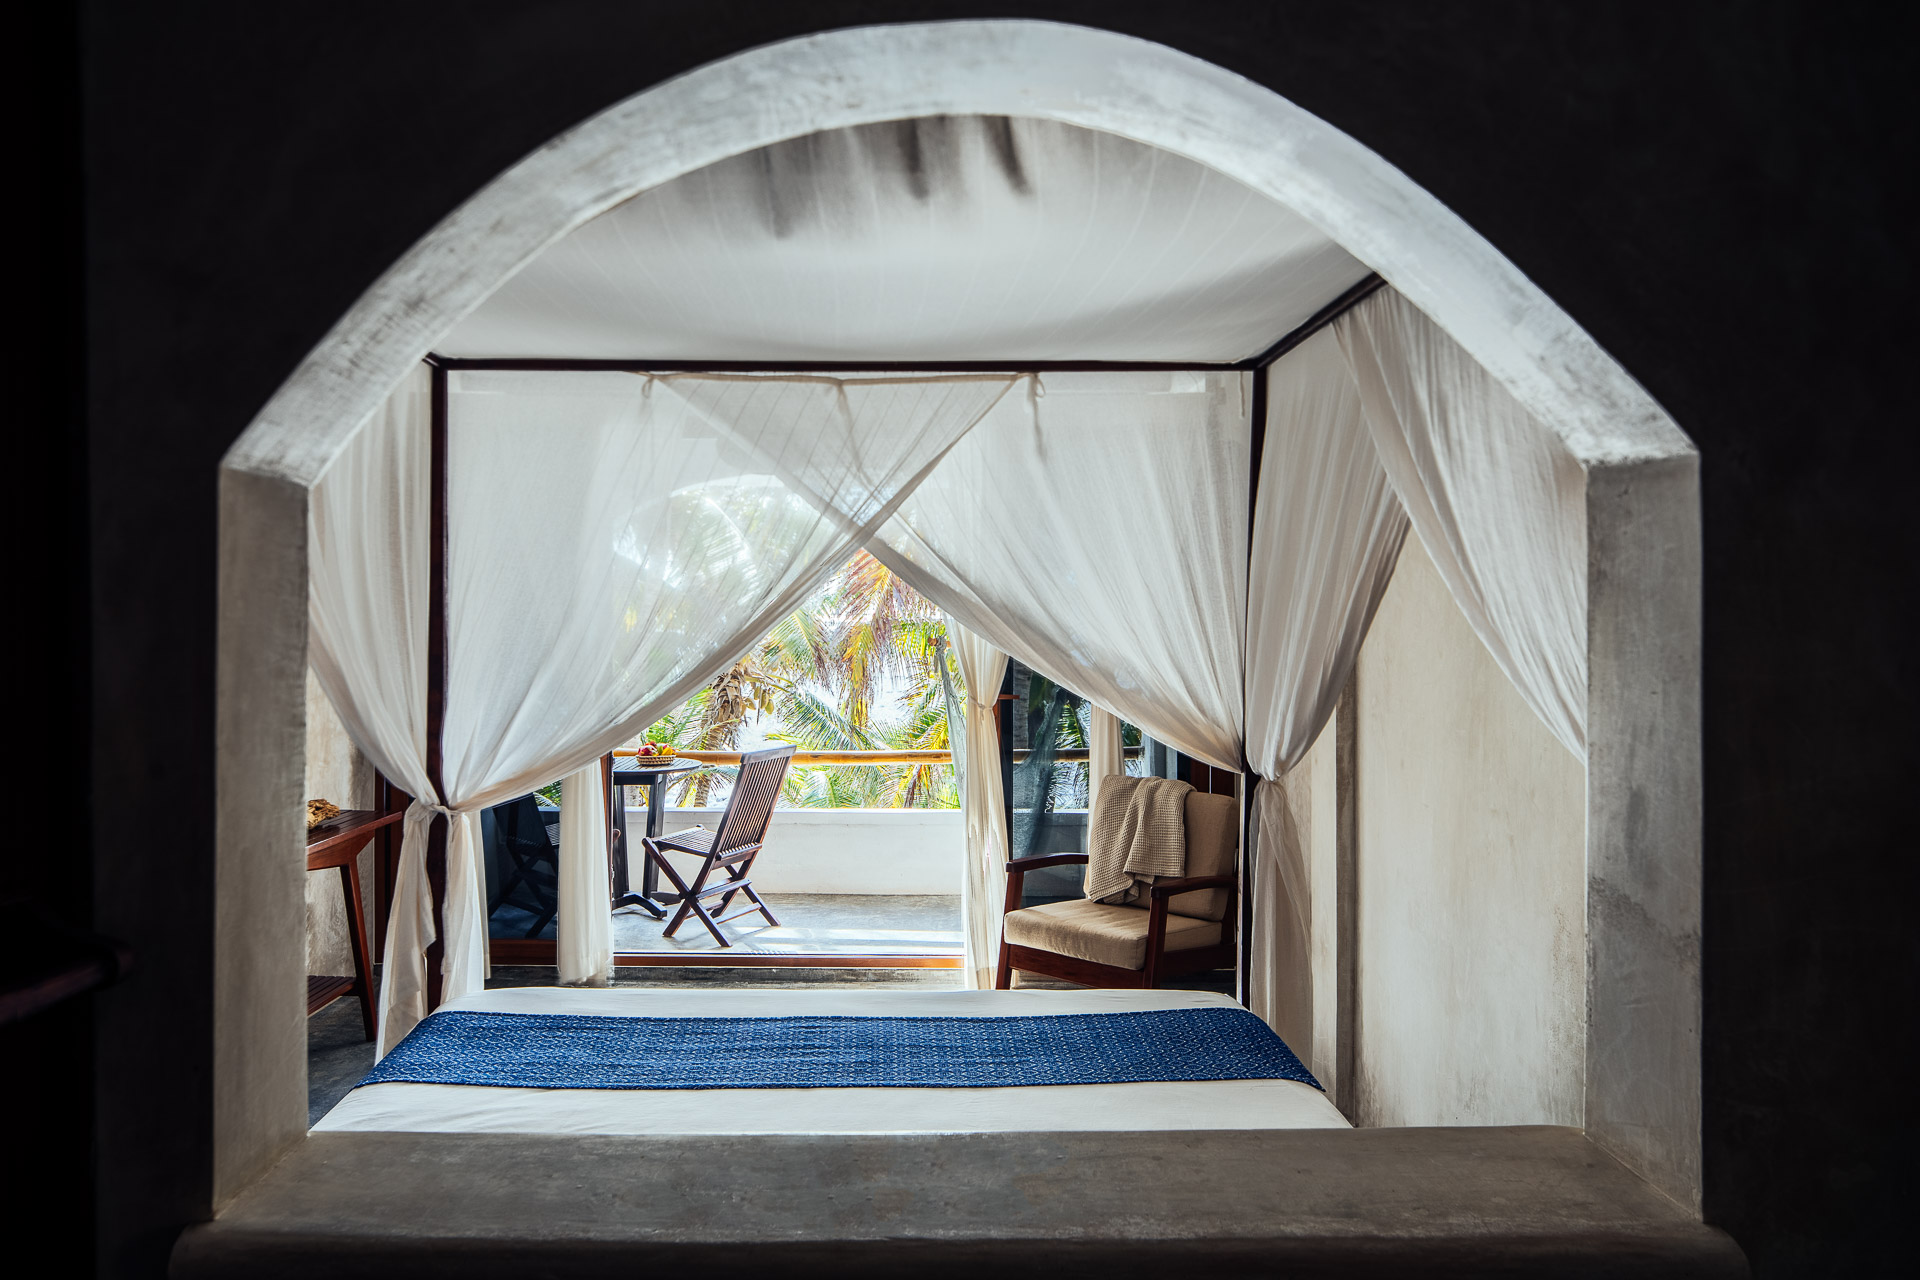 caribbean-hotel-resort-photographer-olas-tulum-mexico--13.jpg